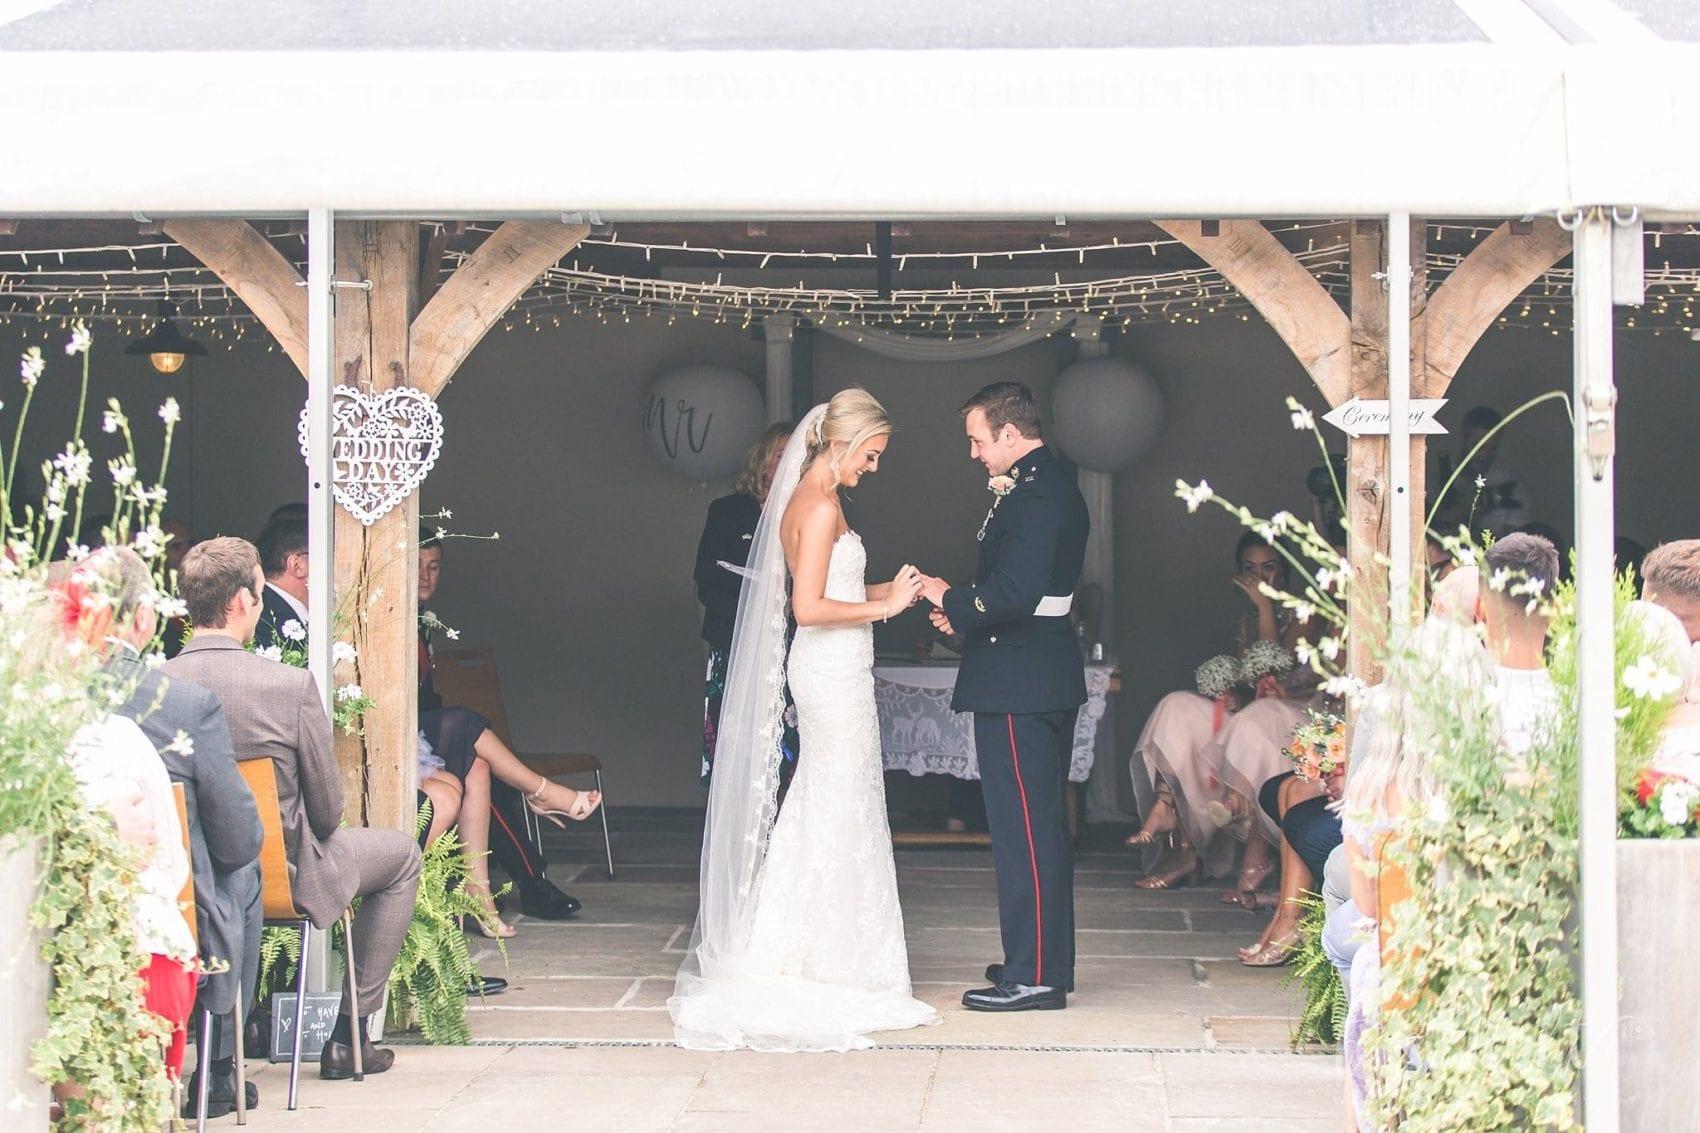 legal ceremony, ever after, summer, wedding barn, registrar, vows, guests